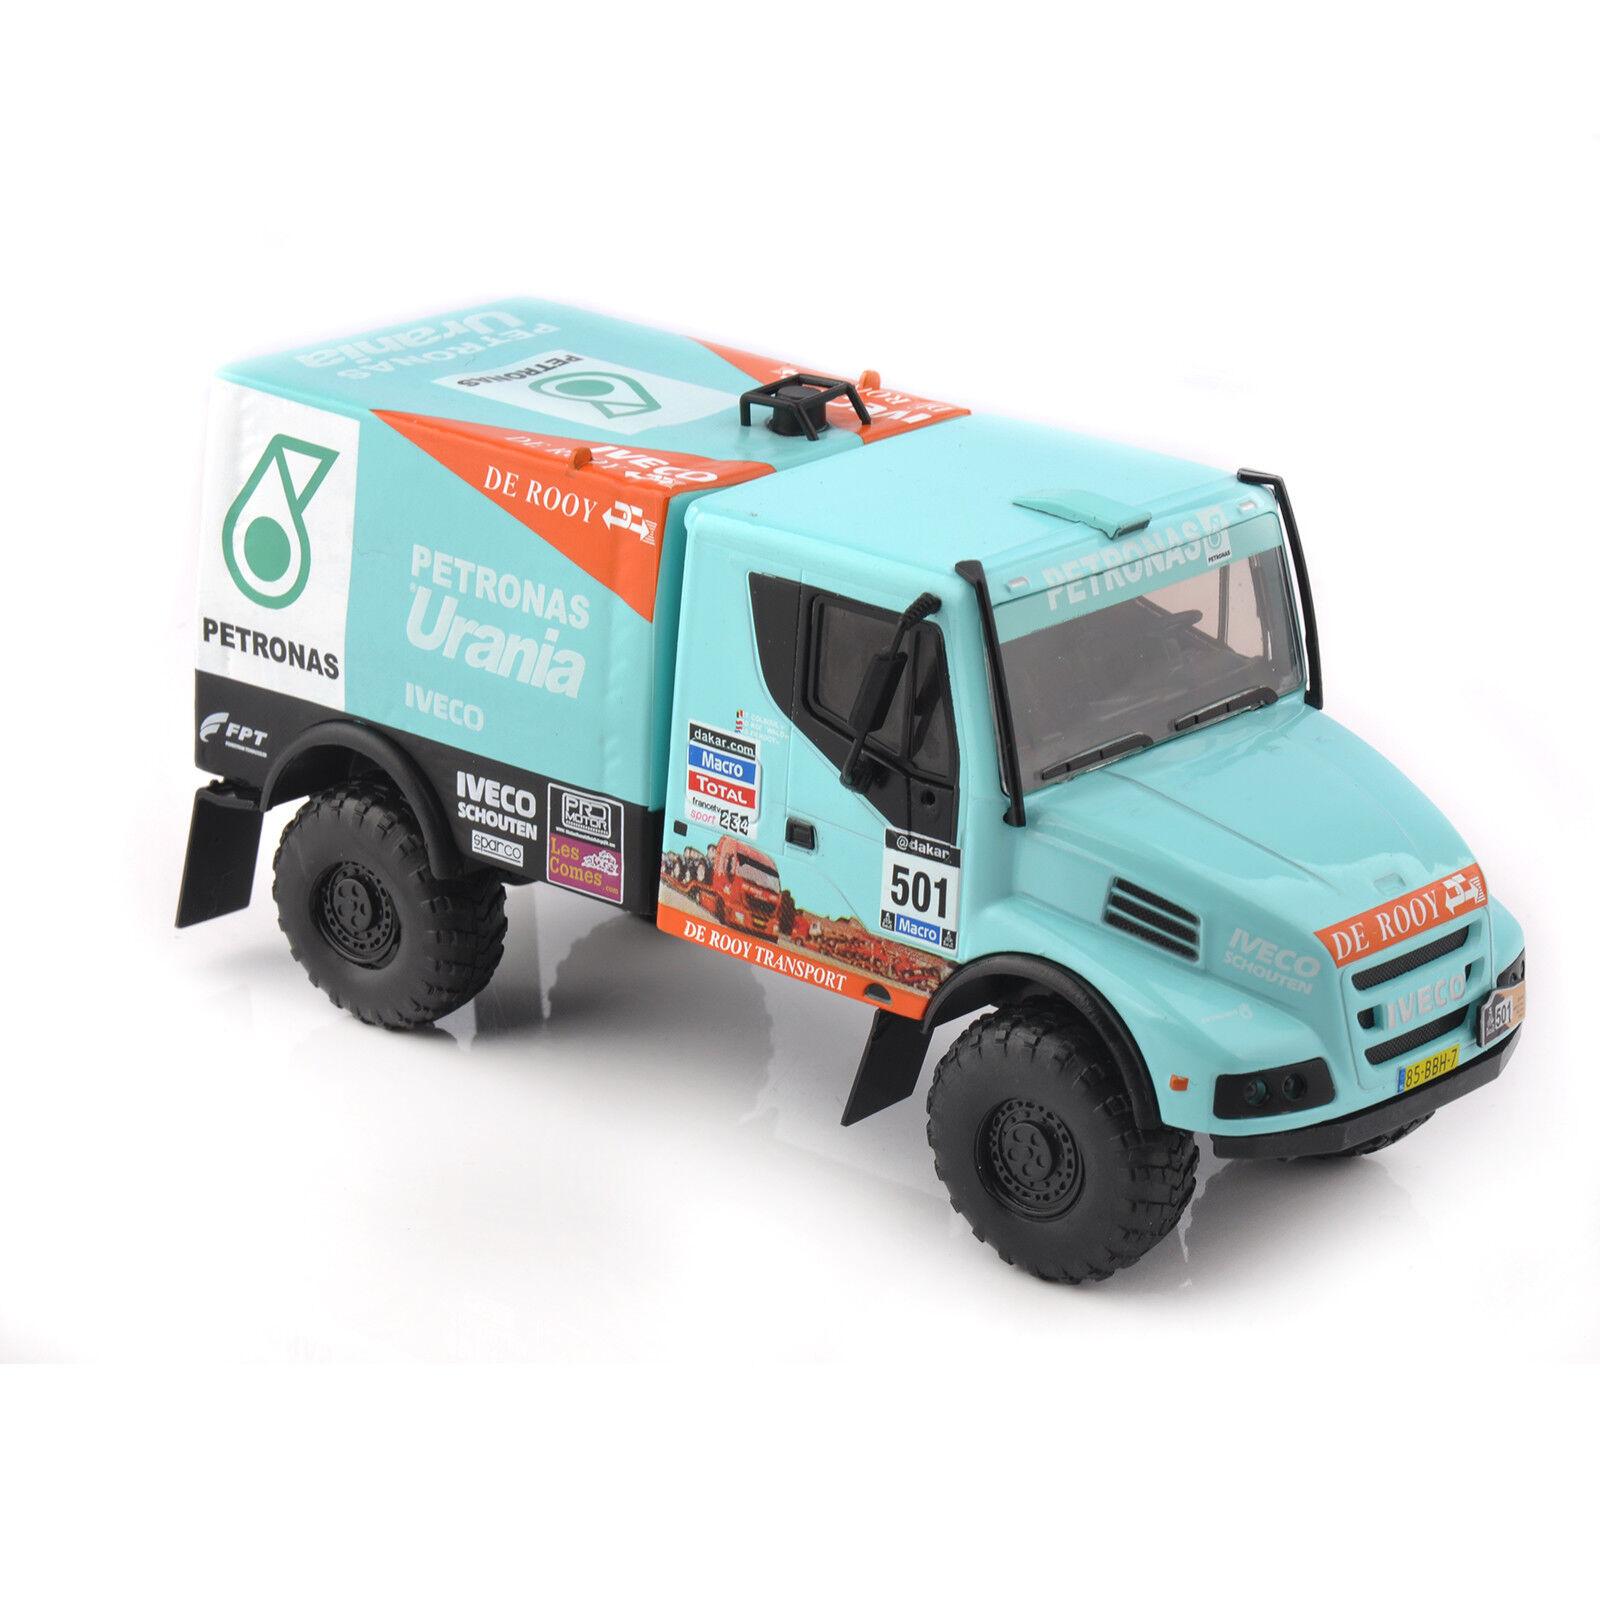 1 43 Dakar Diecast 2014 IVECO Powerstar Racing Rally Car Collection Toy